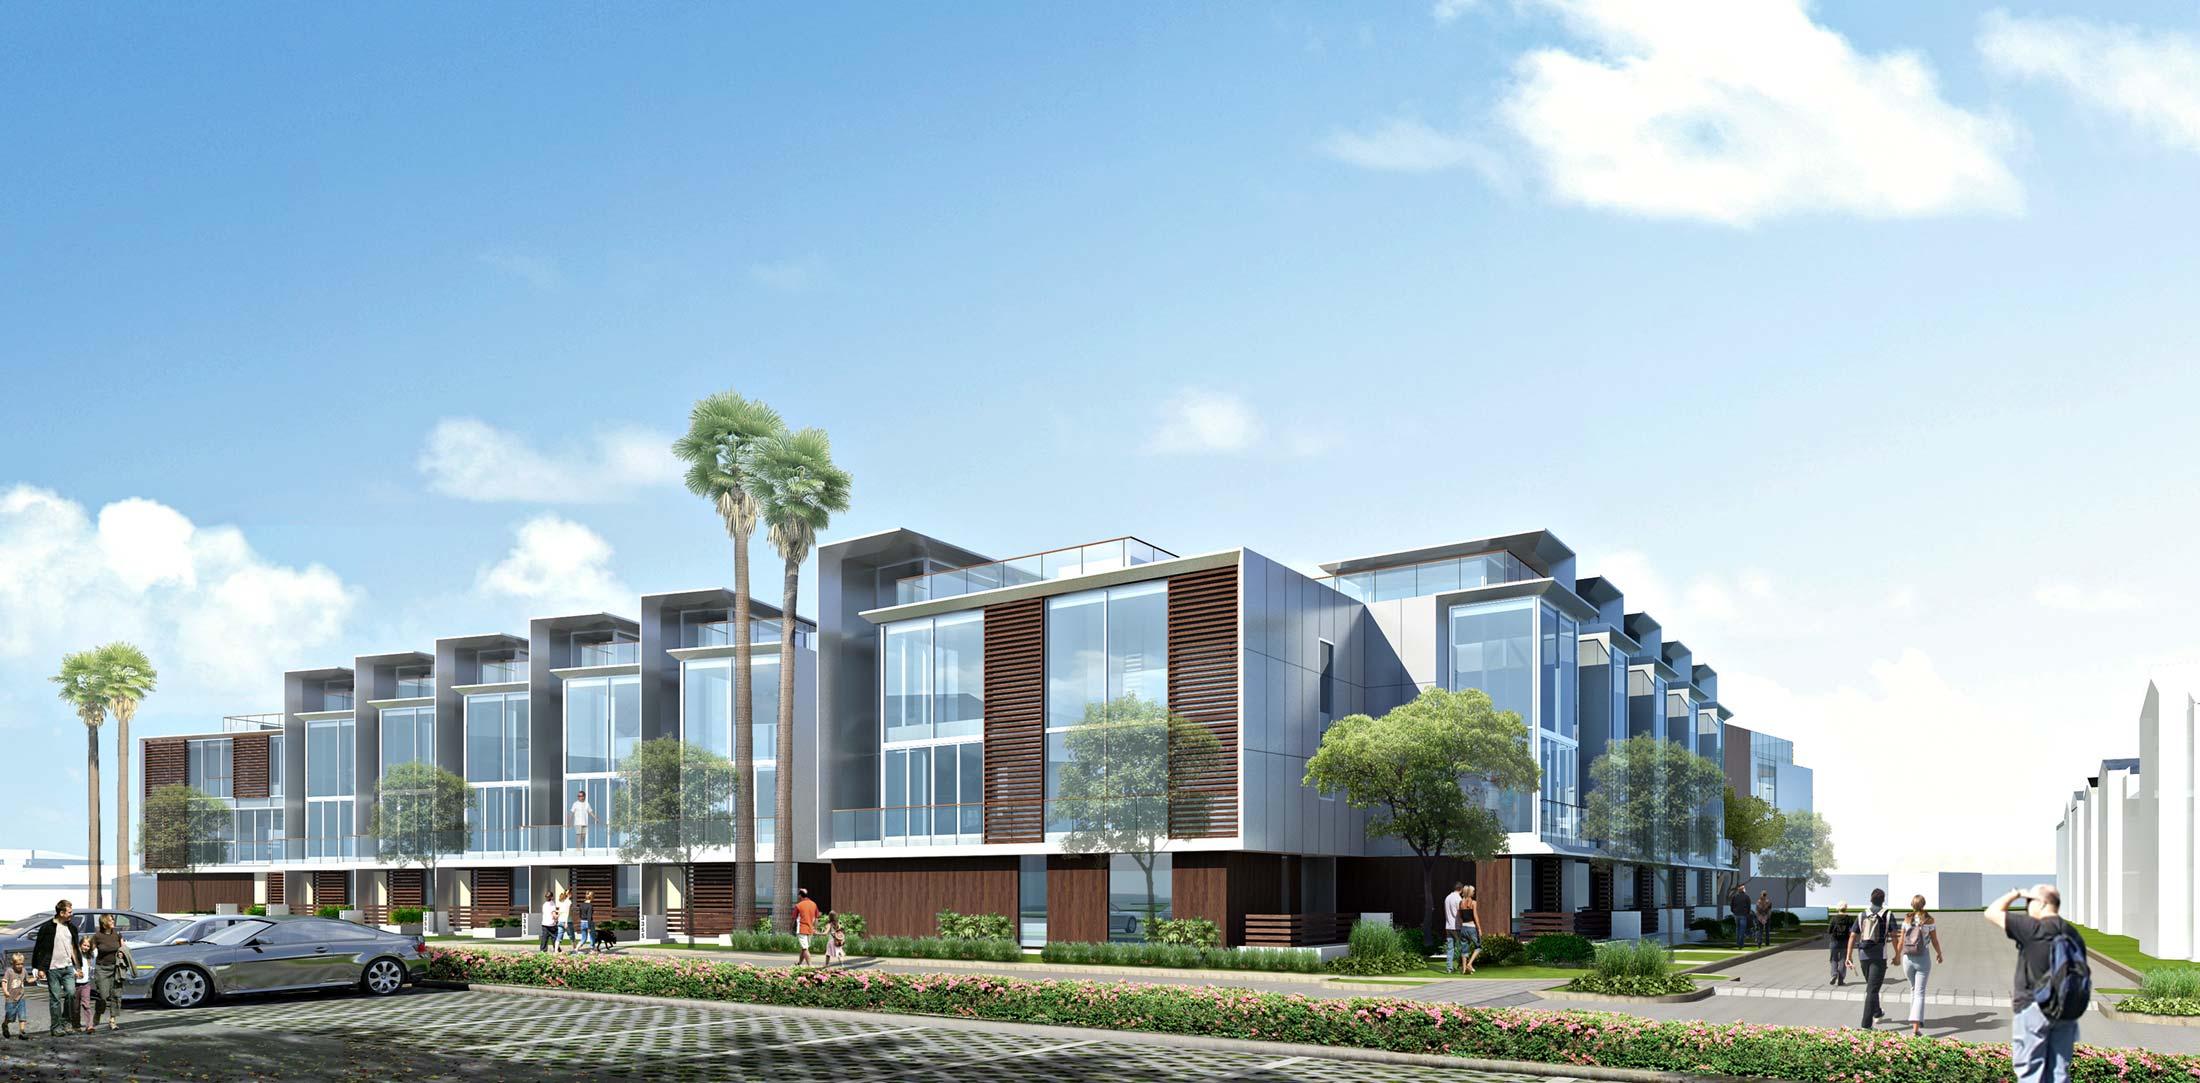 modern-architecture-building-residential-shubindonaldson-via-lido-townhouse-2